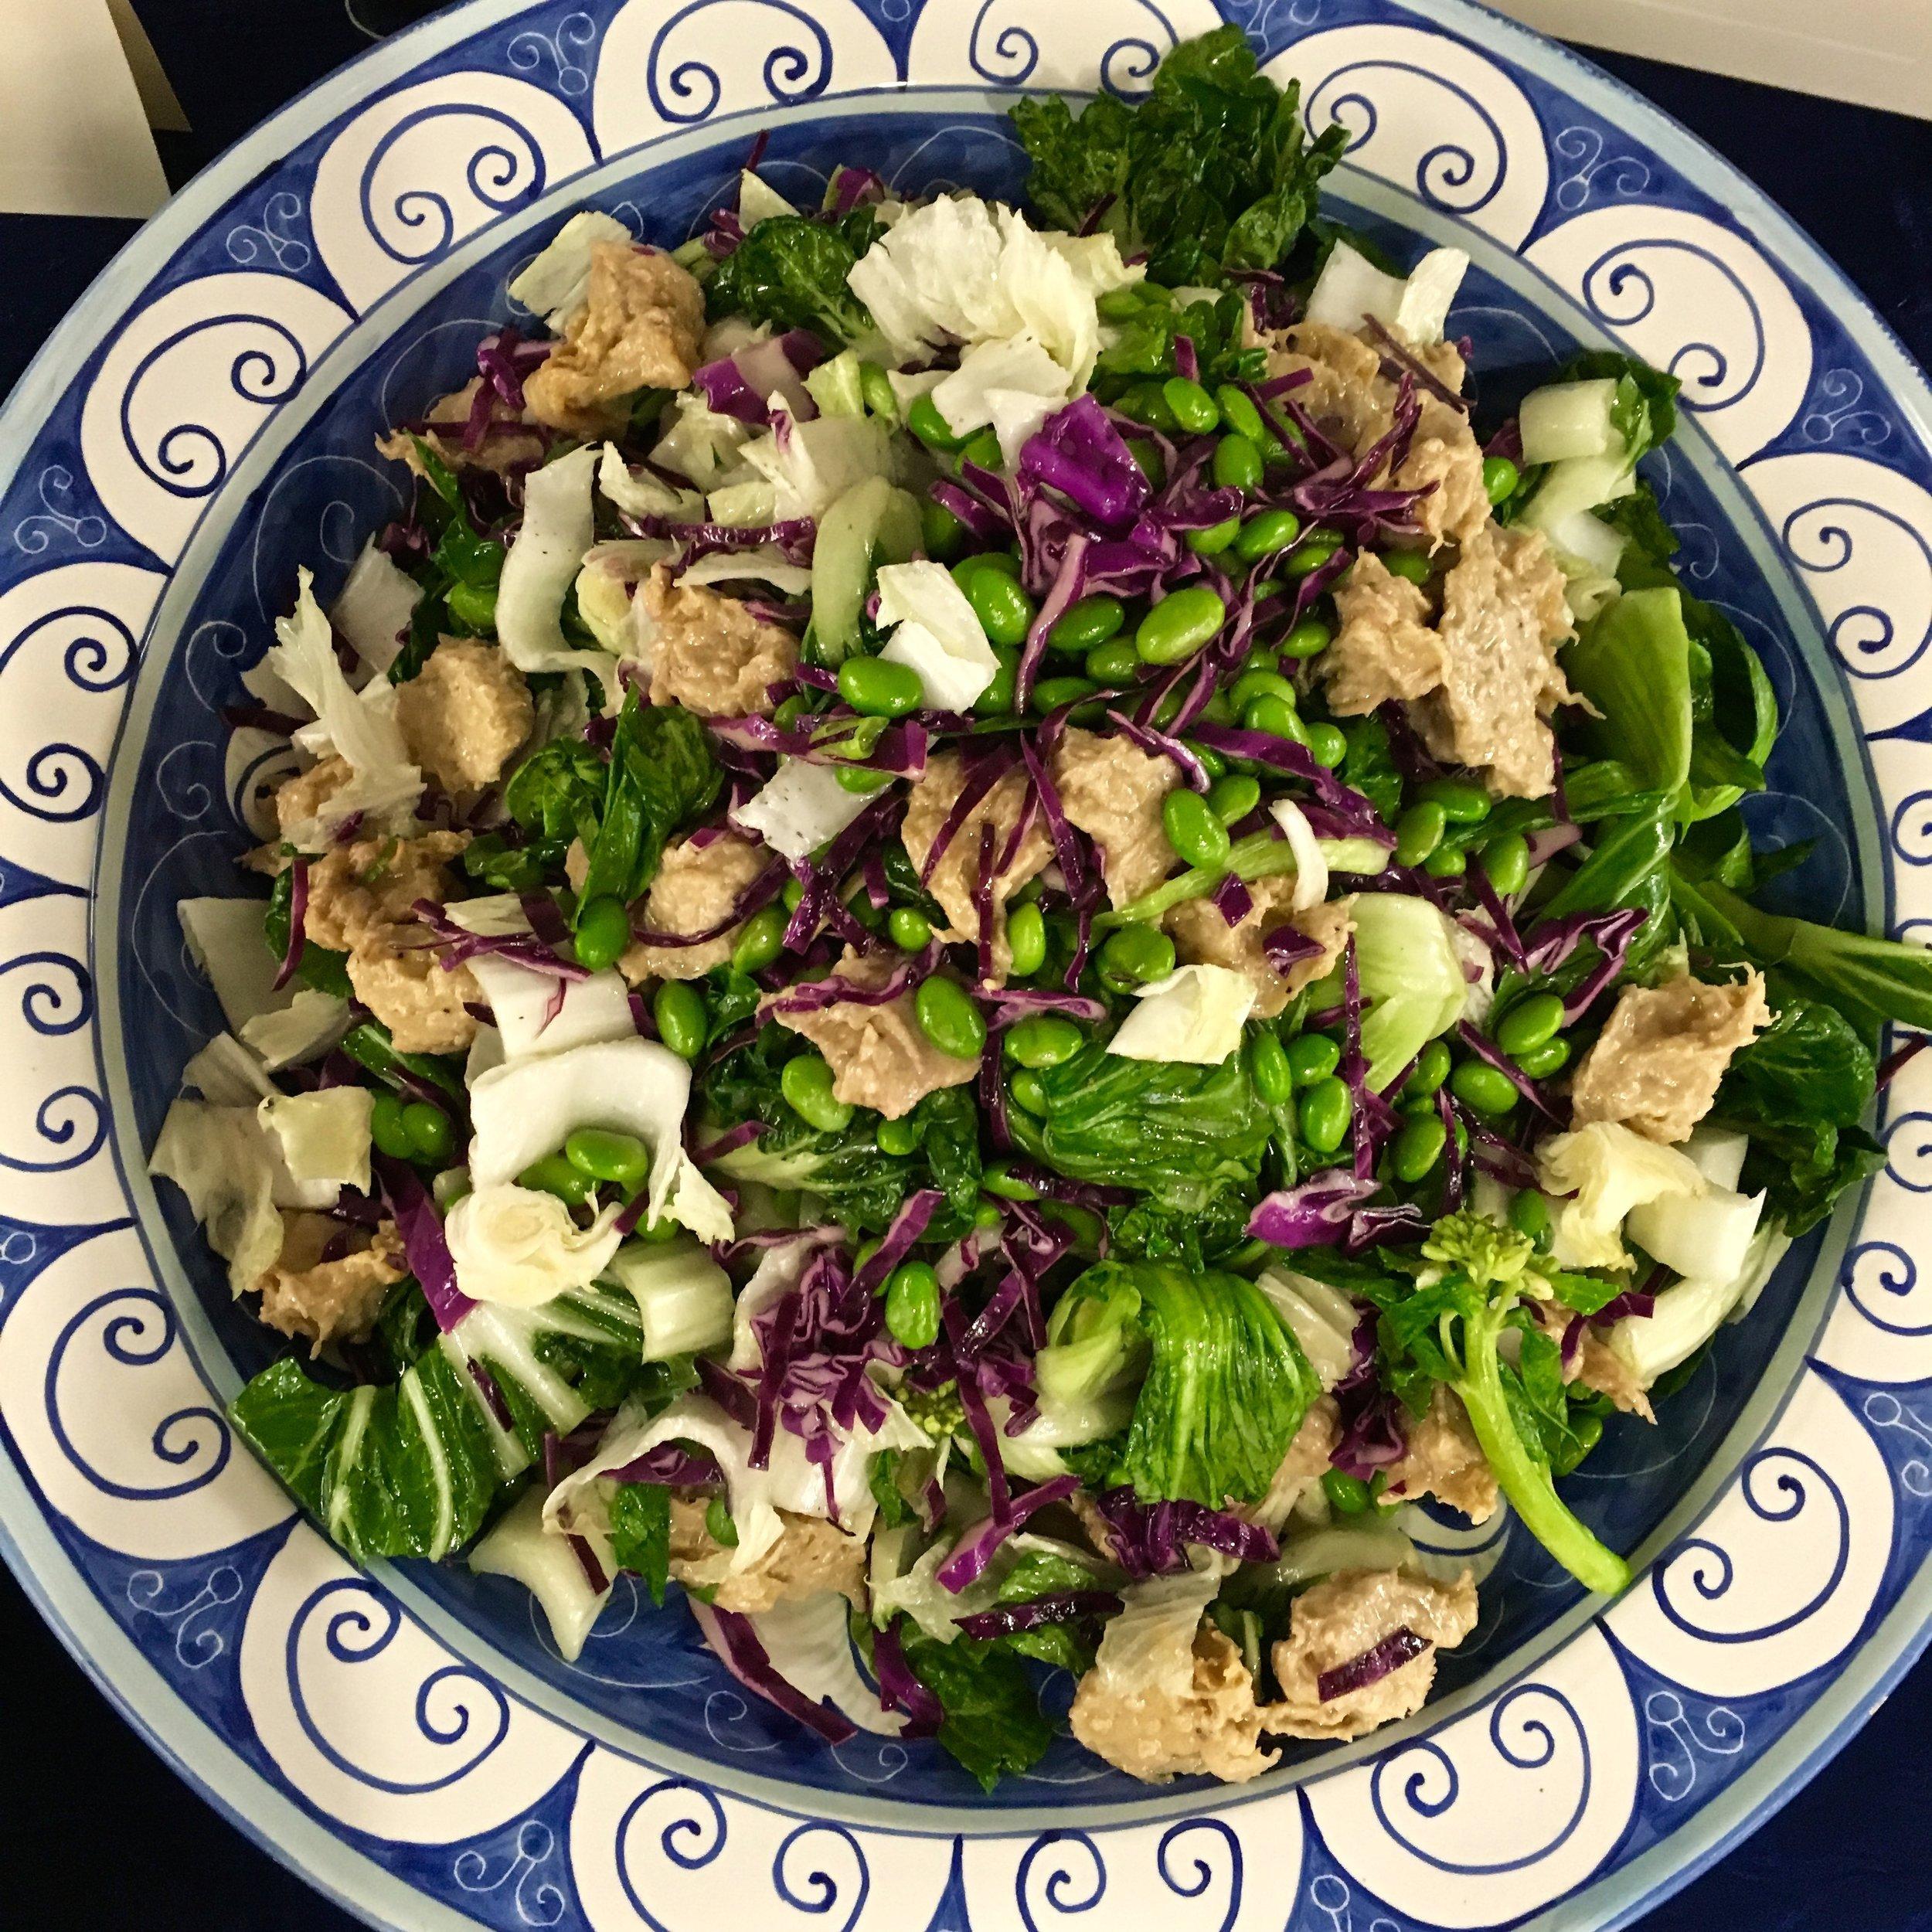 Vegan-Chinese %22faux%22 chicken salad.jpg